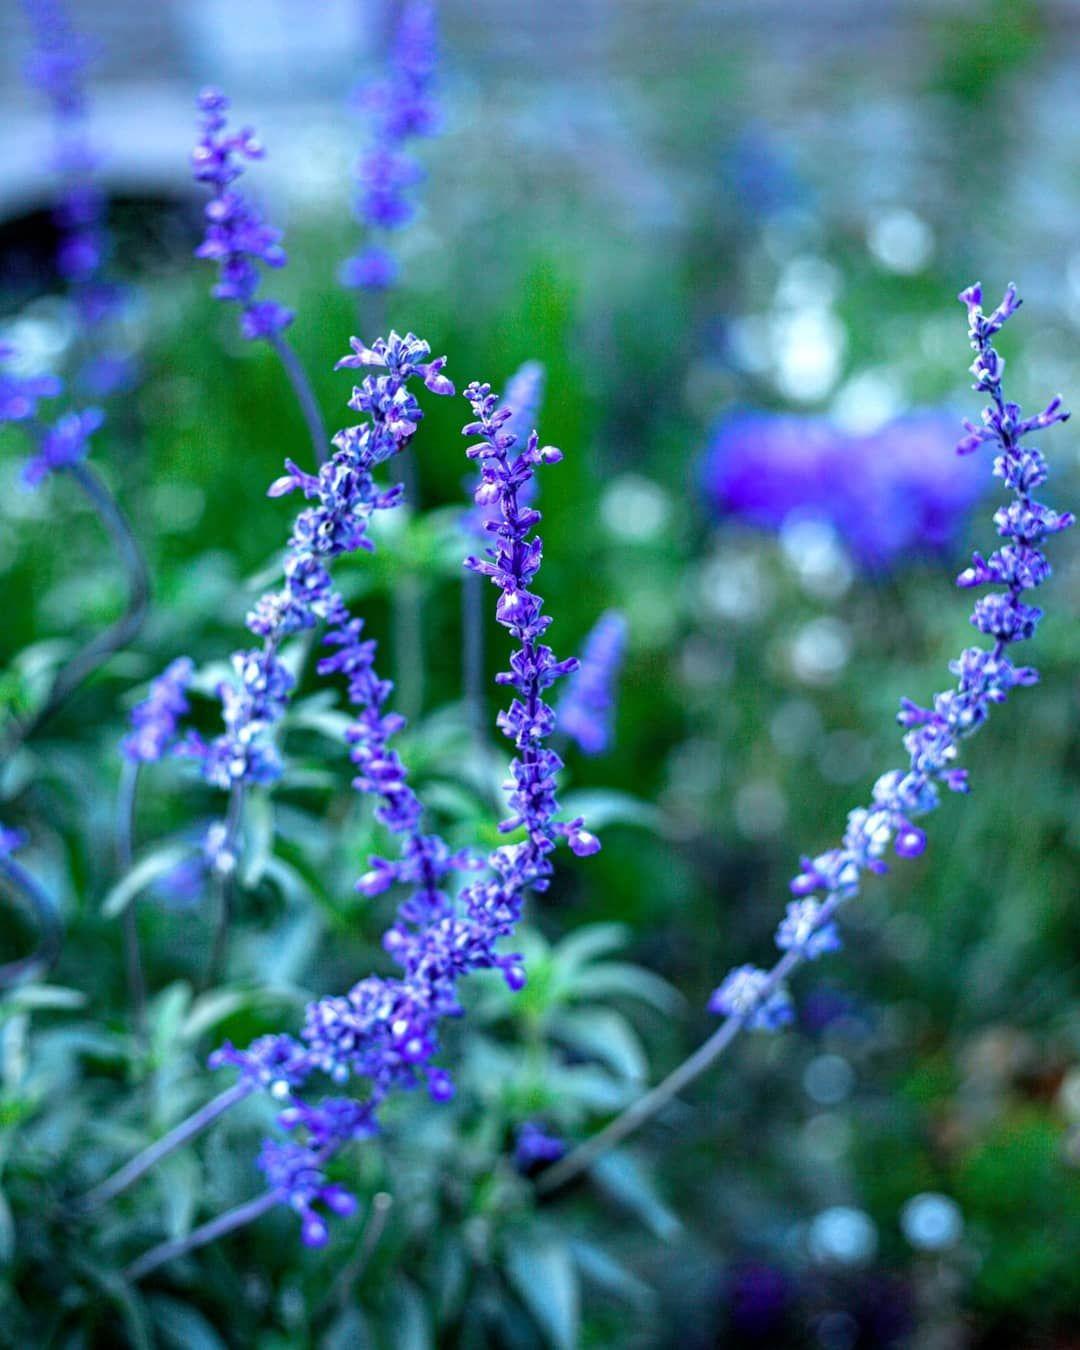 Blue flower. Kassel, Karlsaue.  Photographer: @salogwyn_fine_Art  #nature #naturelovers #casselfornia #kassel #kasselfornia #wonderful_places #wonderfullife #beautifulnature #beautifullight #motherearth #worldbestshot #seascape #photography #divine_worldplaces #challenge #photooftheday #photoshoot #colorful #gurushotschallenge #gurushots #shotaward #ig_mood #autumn #autumnvibes🍁 #amazing_shots #blueflowers💙 #flowermagic #flowermagazine #color